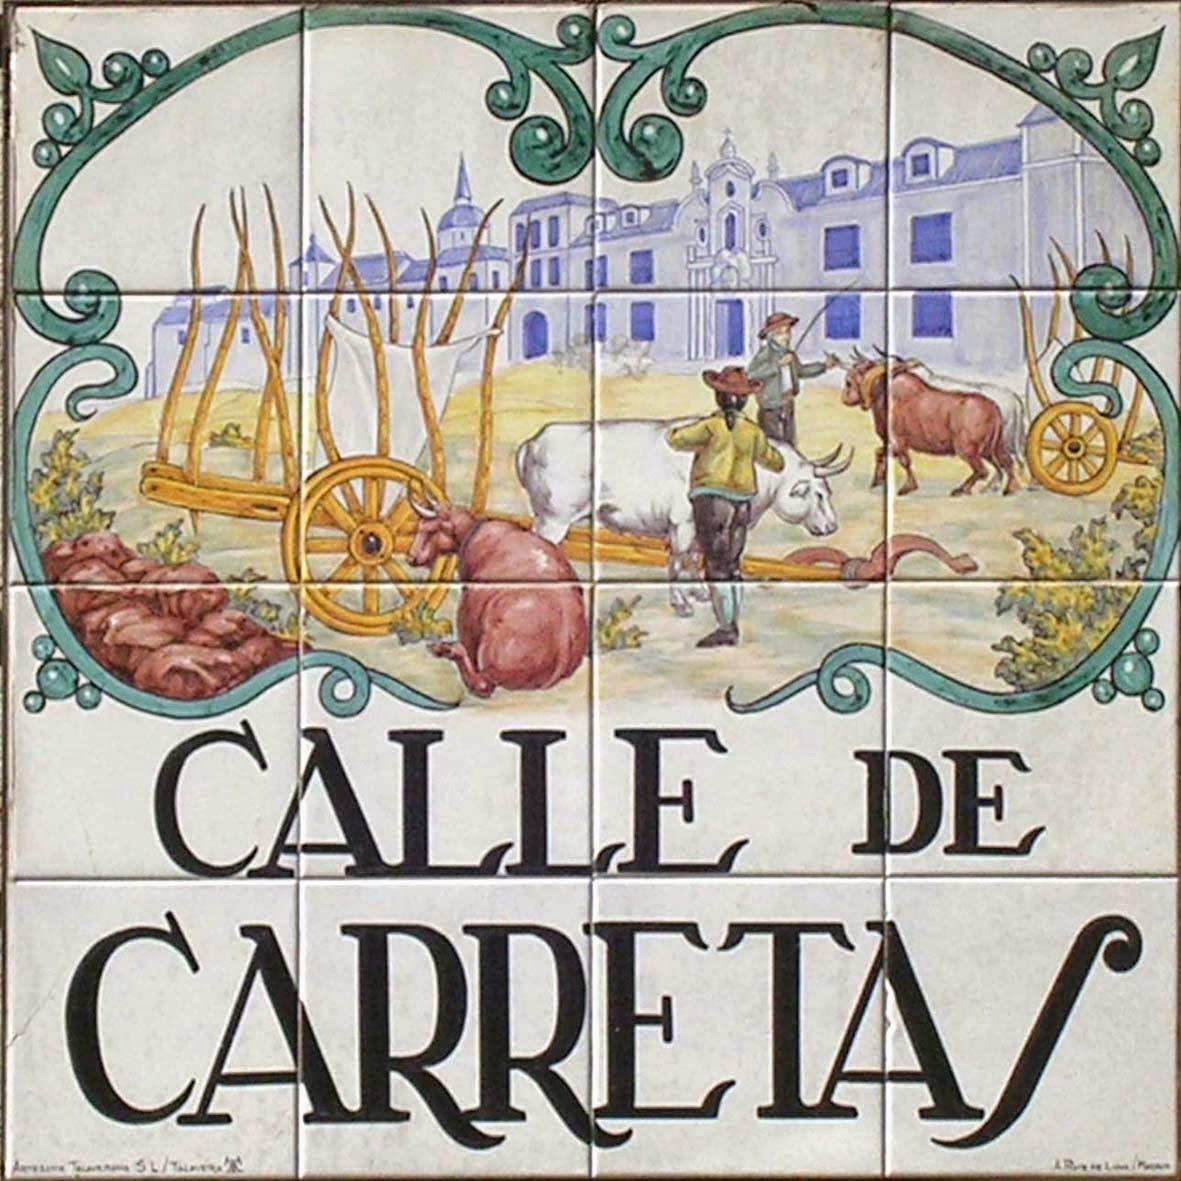 Calle de Carretas